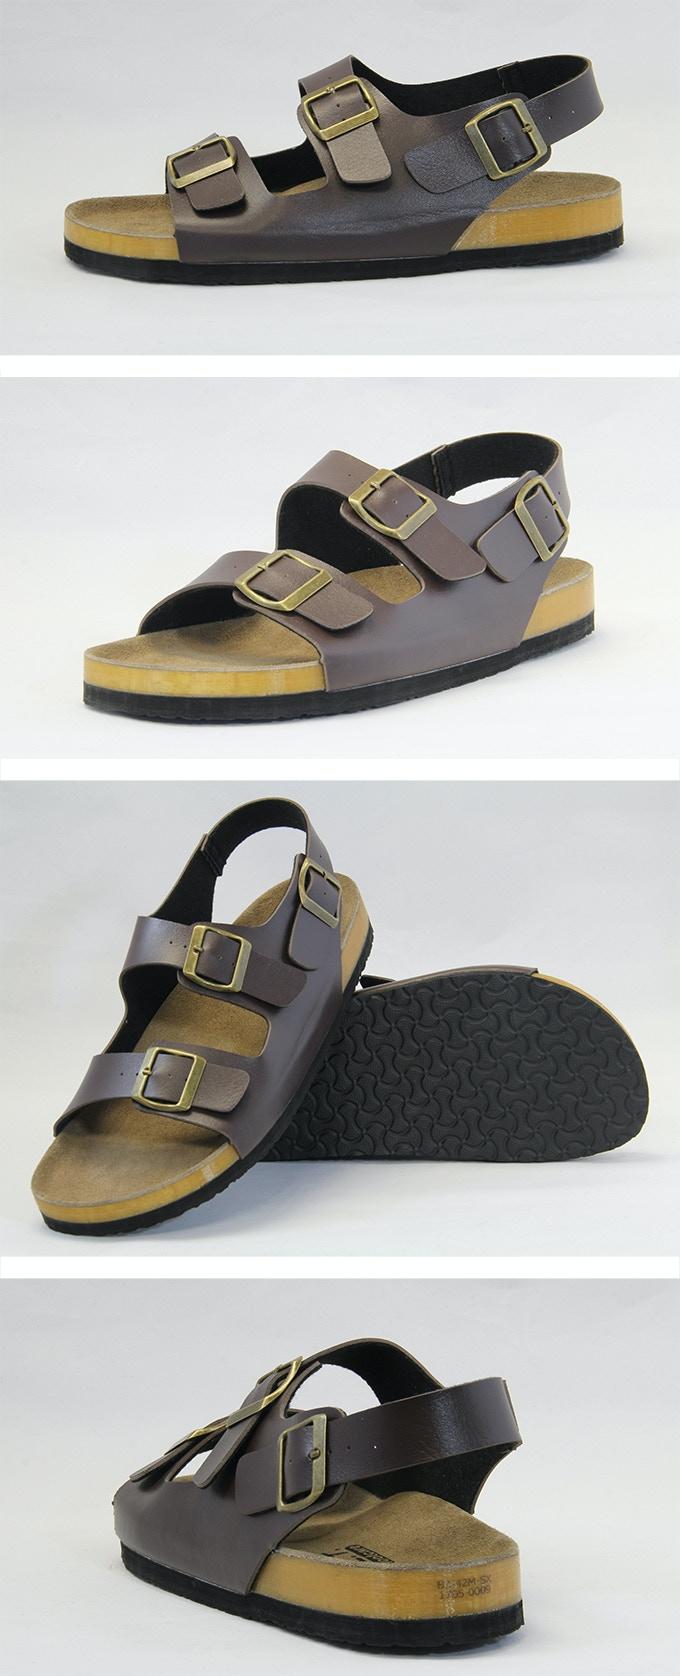 3-strap unisex sandals